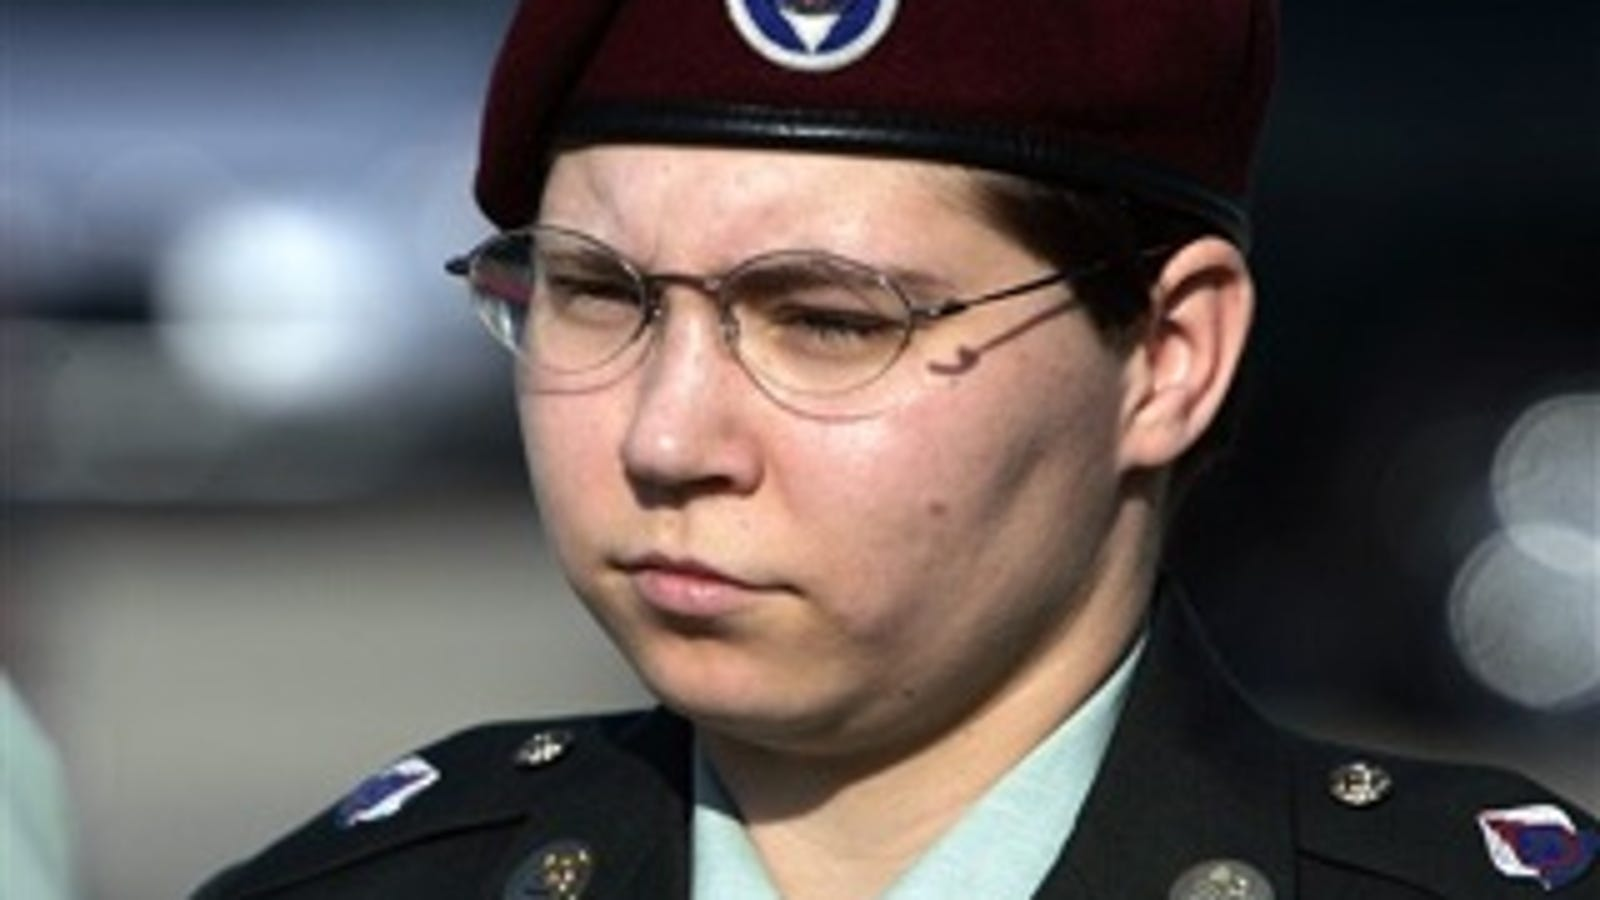 Abu ghraib female prison guard sexual misconduct